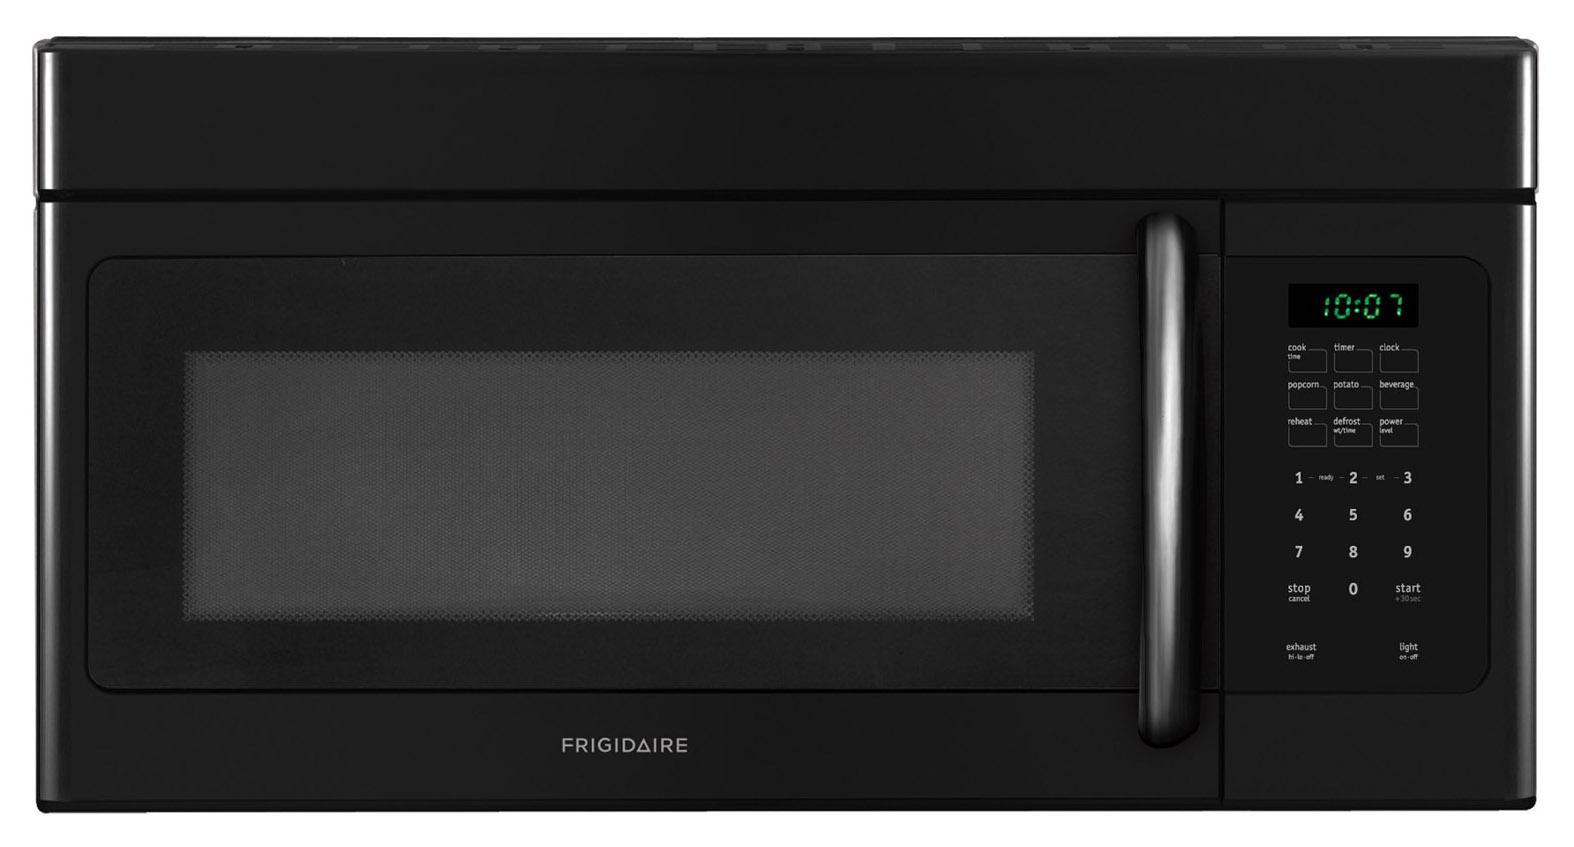 Frigidaire Microwaves 1.6 Cu. Ft. Over-The-Range Microwave - Item Number: FFMV162LB